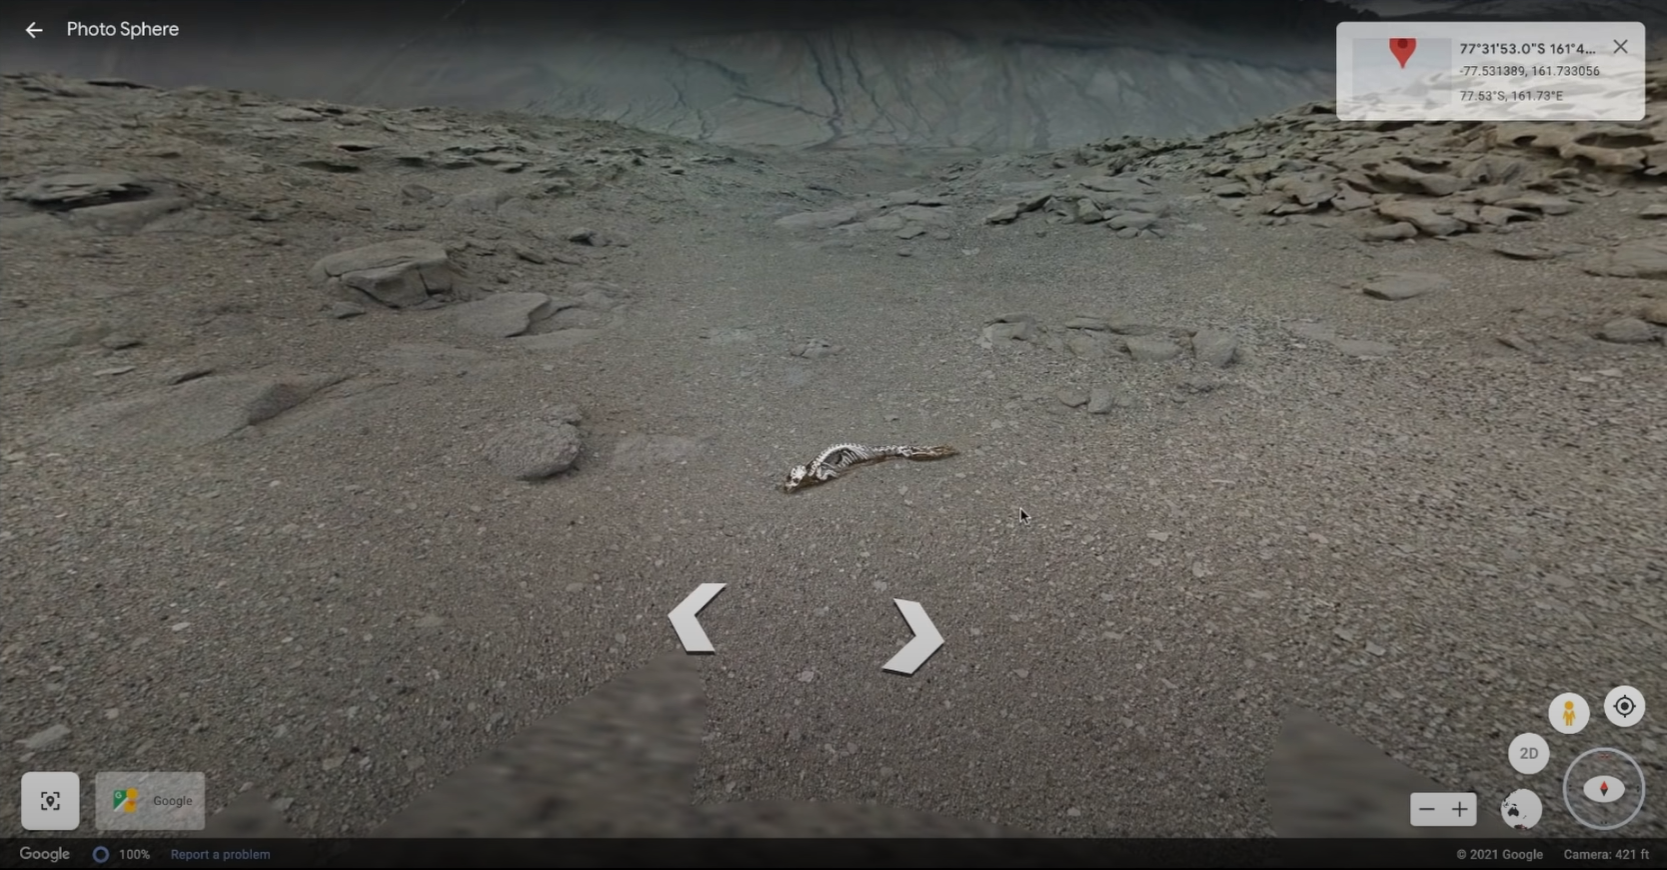 Google街景驚見「神秘生物骸骨」 他放大細看...白骨真身曝光